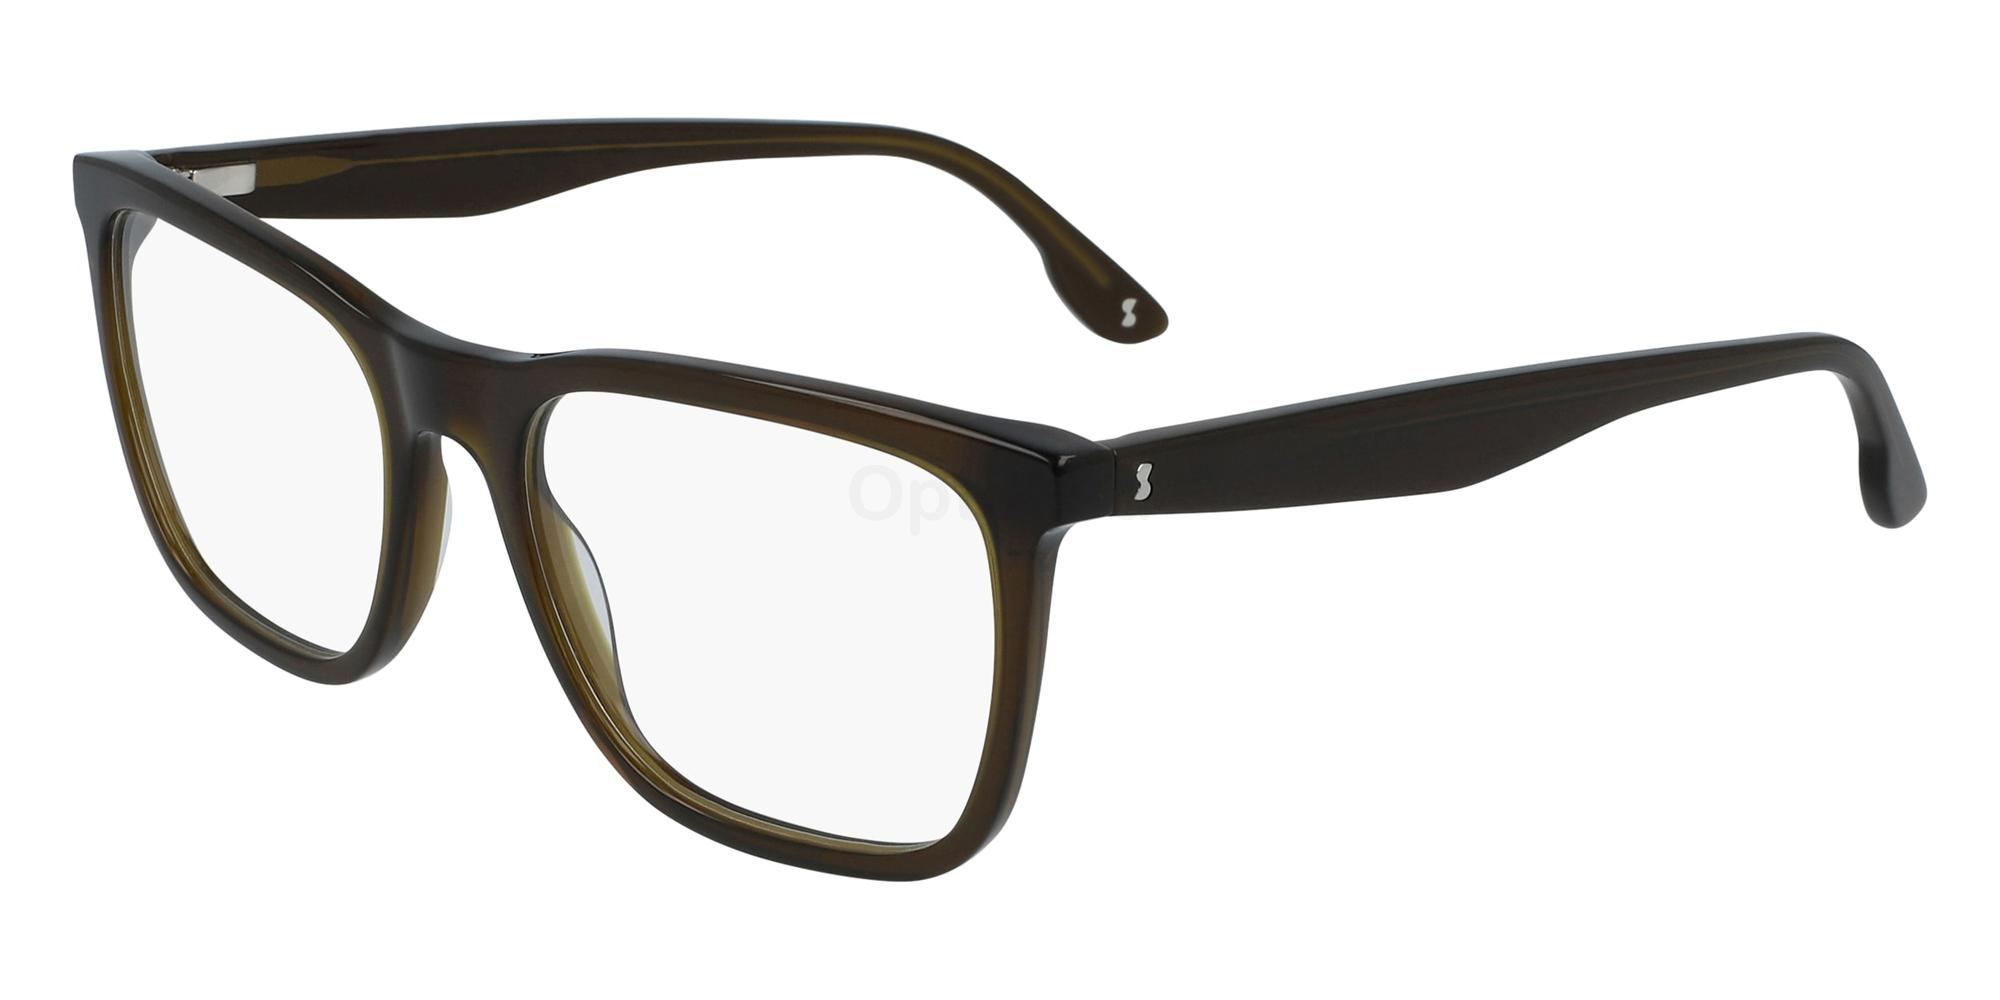 317 SK2849 SPETSNATE Glasses, Skaga